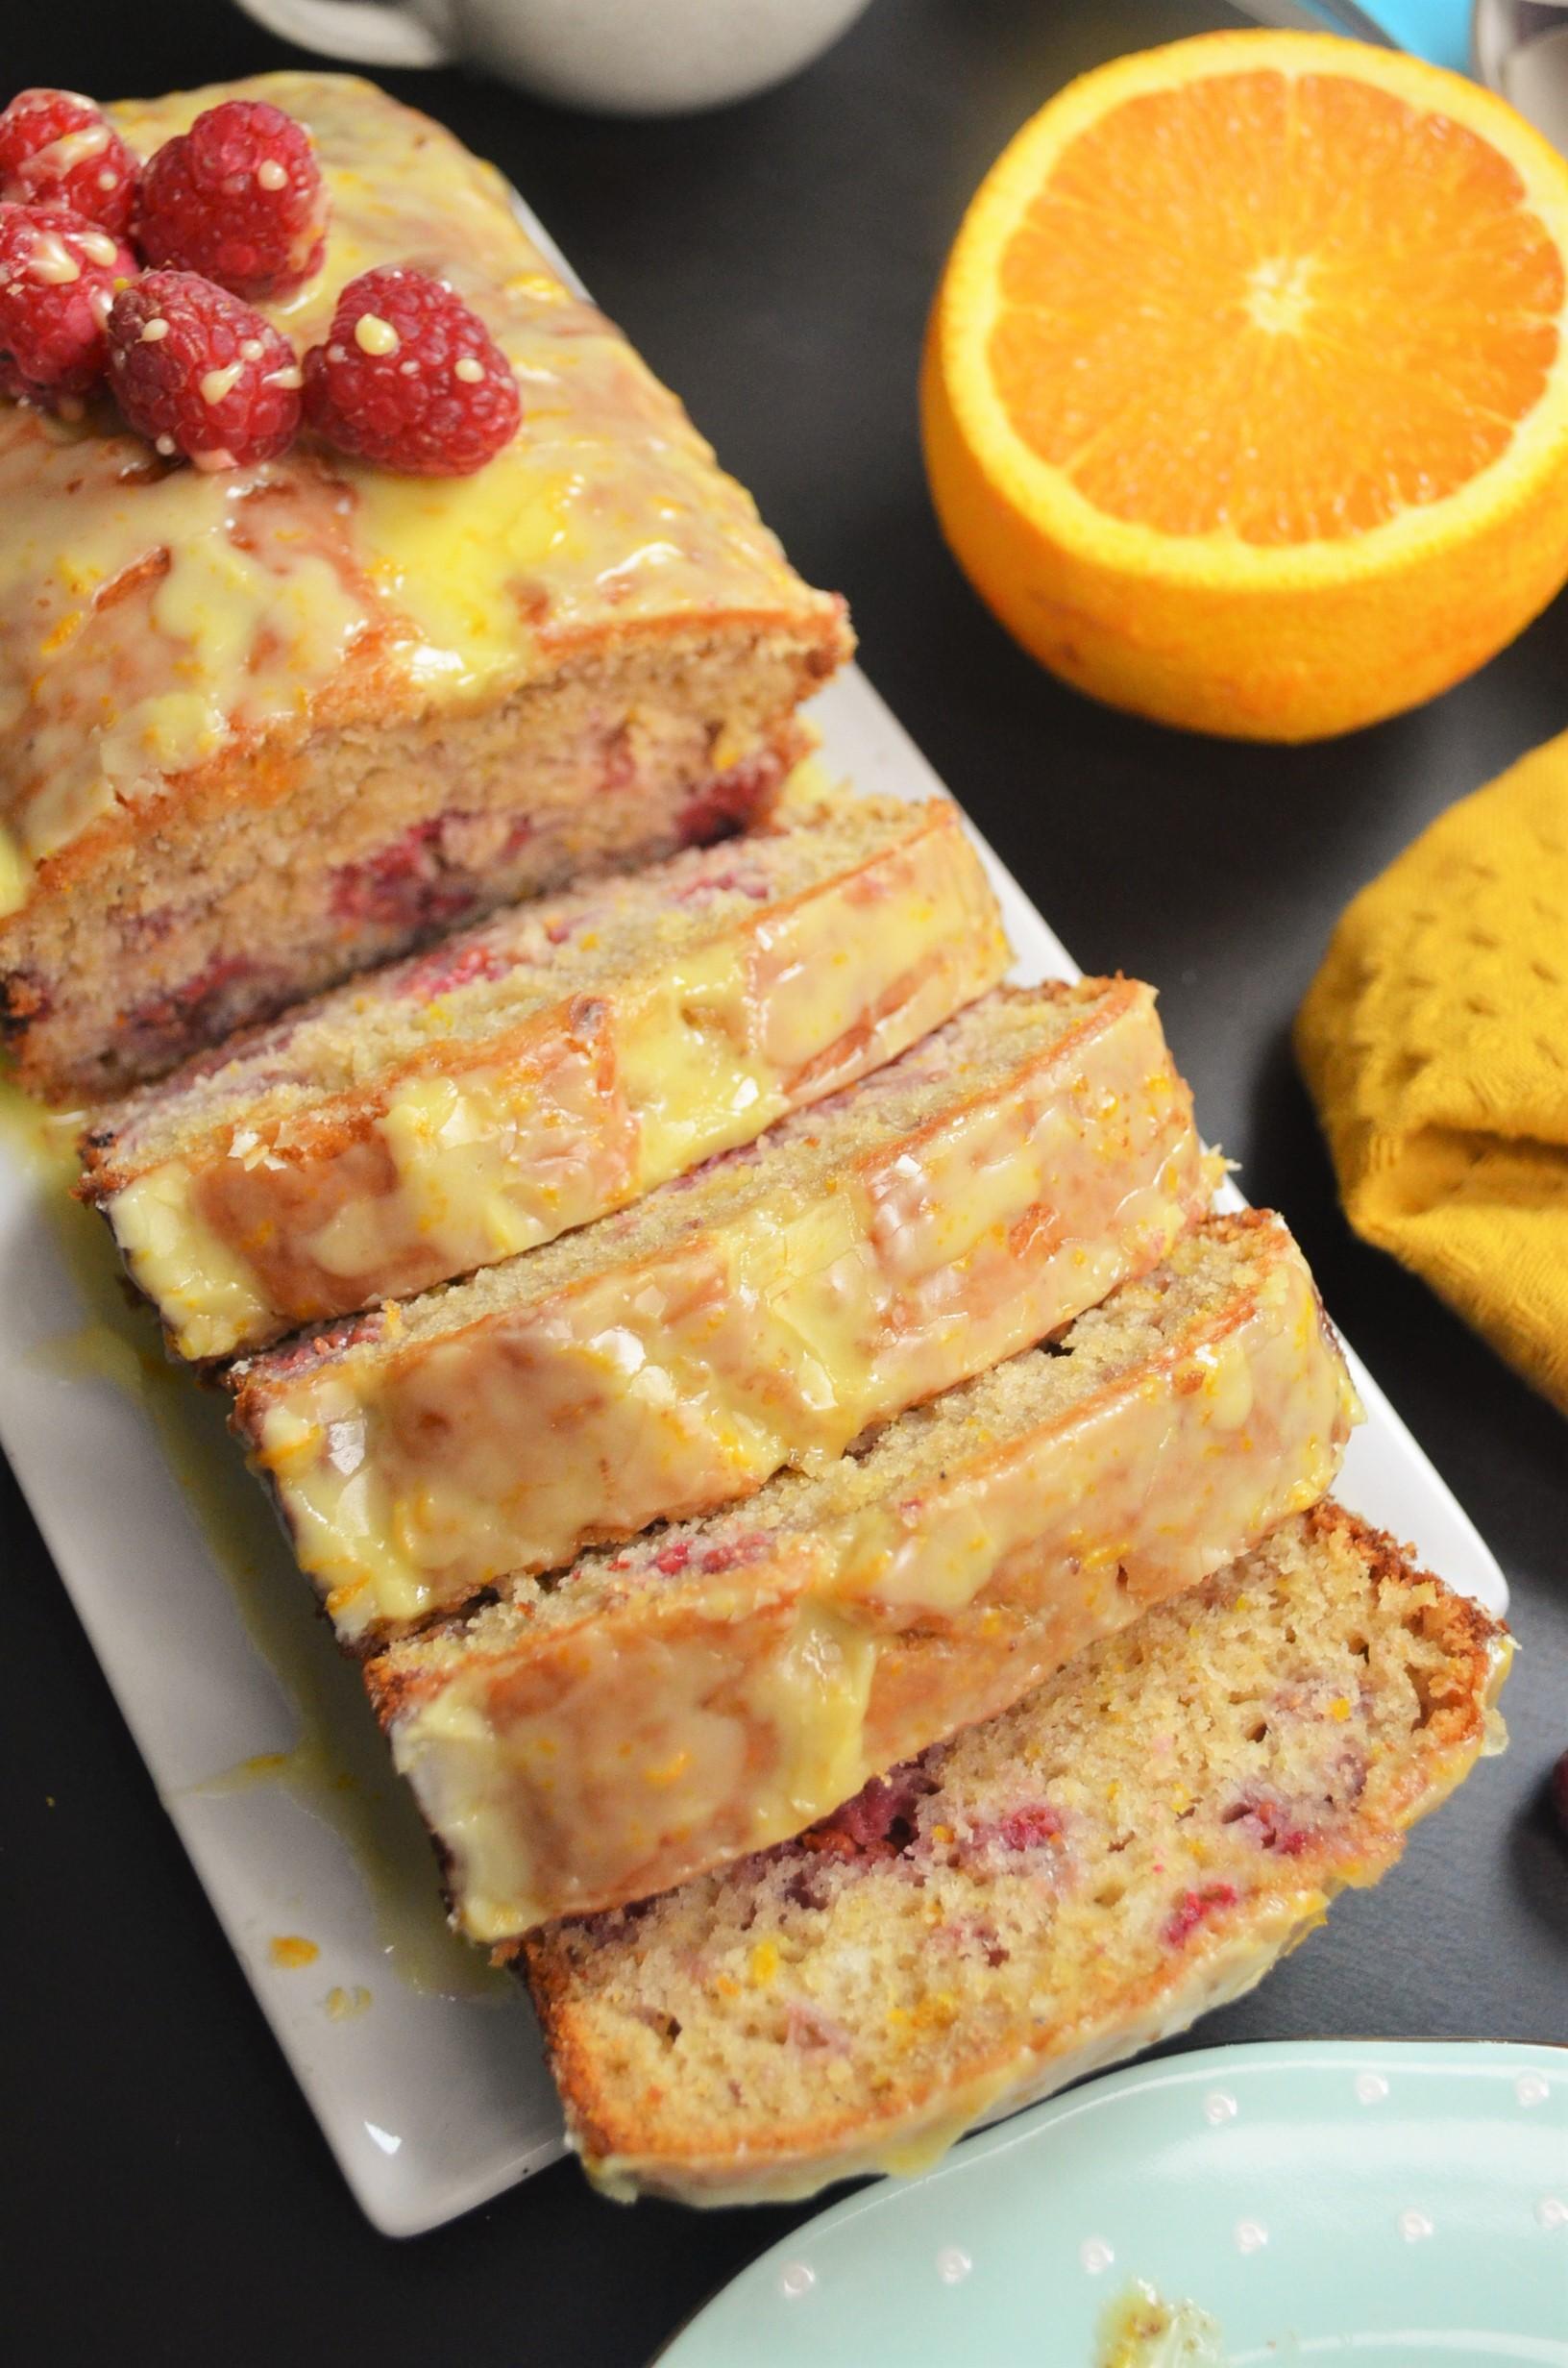 Orange and Raspberry Loaf with Orange Glaze